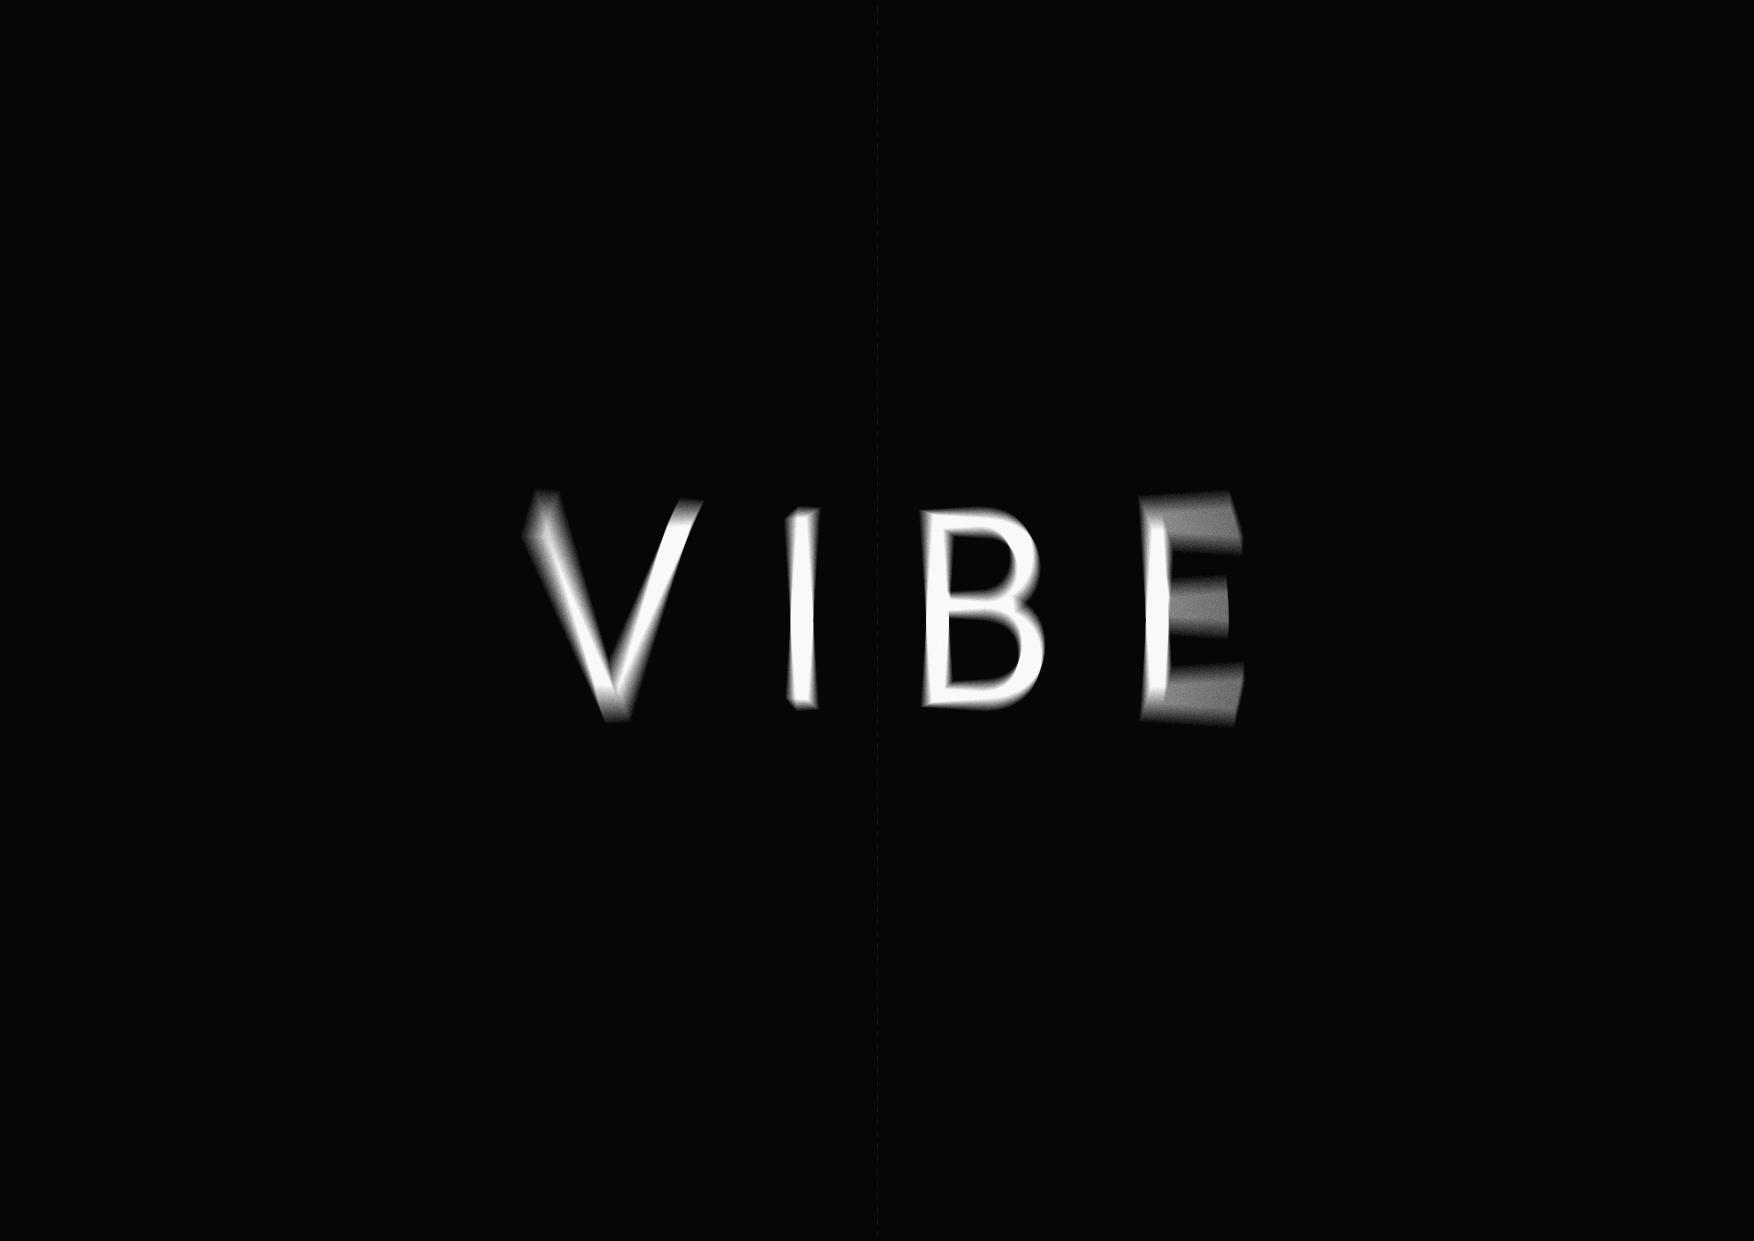 VIBE image-02.png